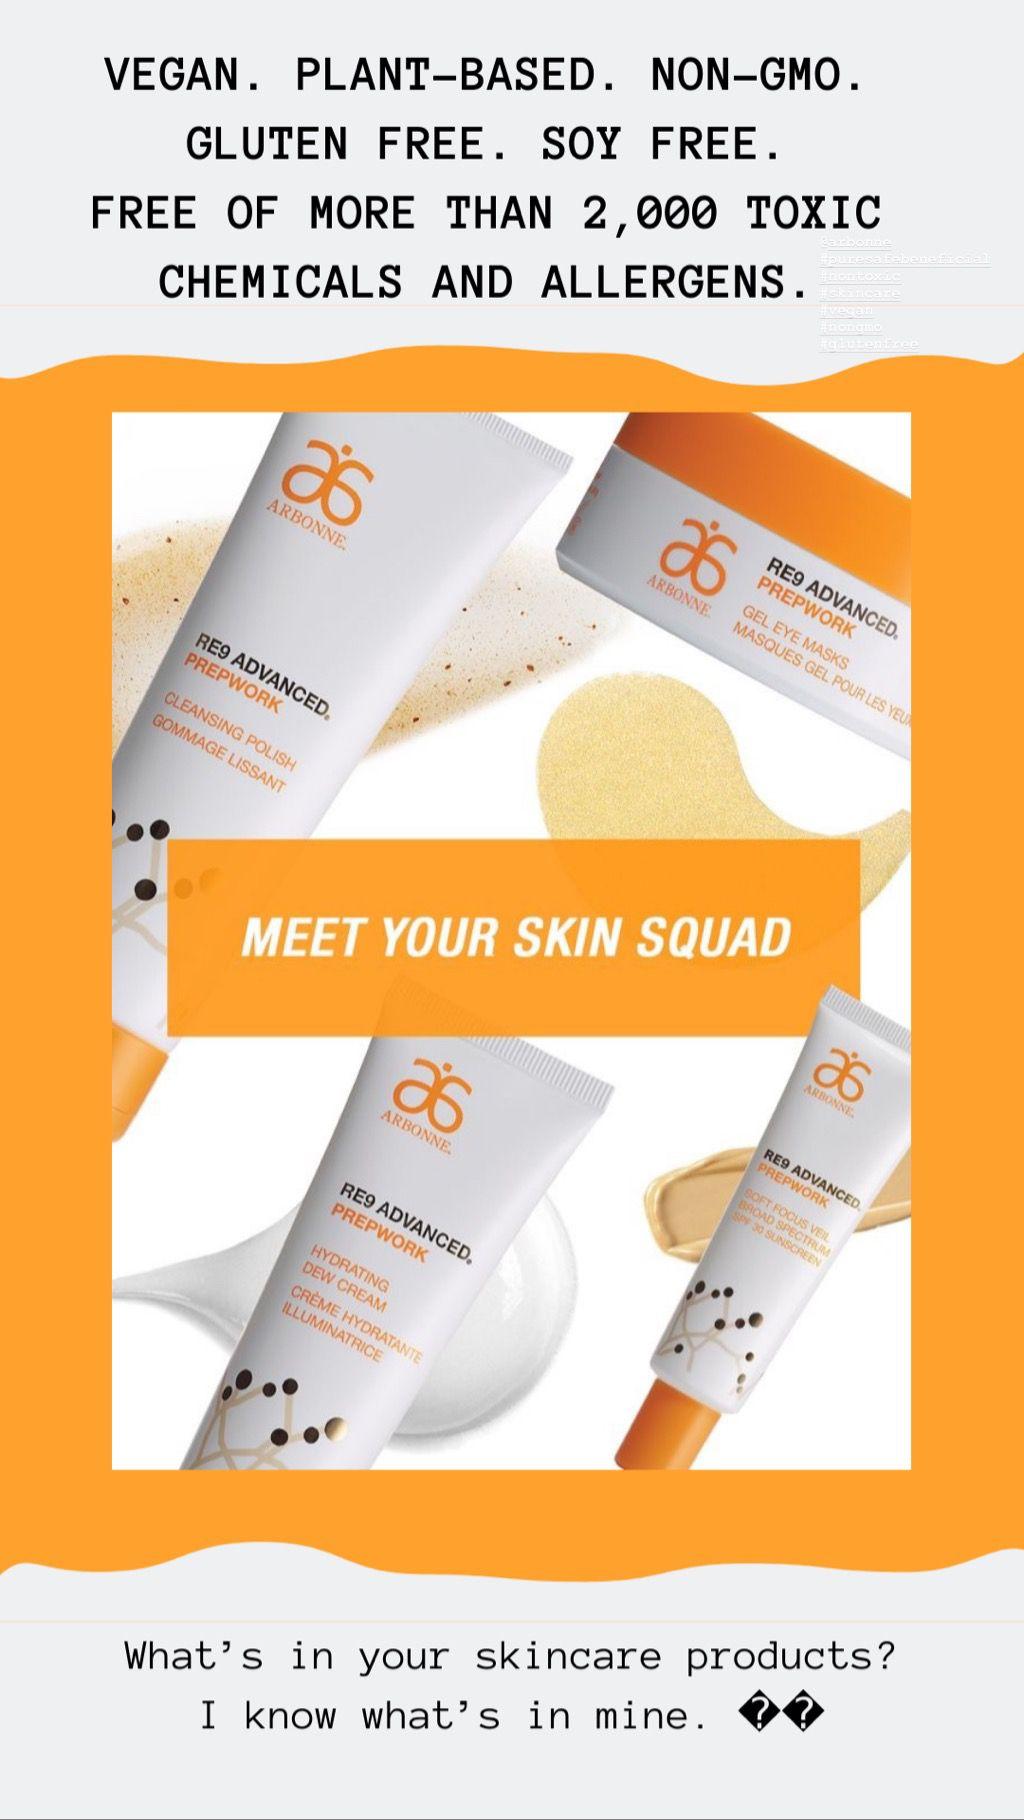 RE9 Prepwork Anti aging skin products, Arbonne, Skin care